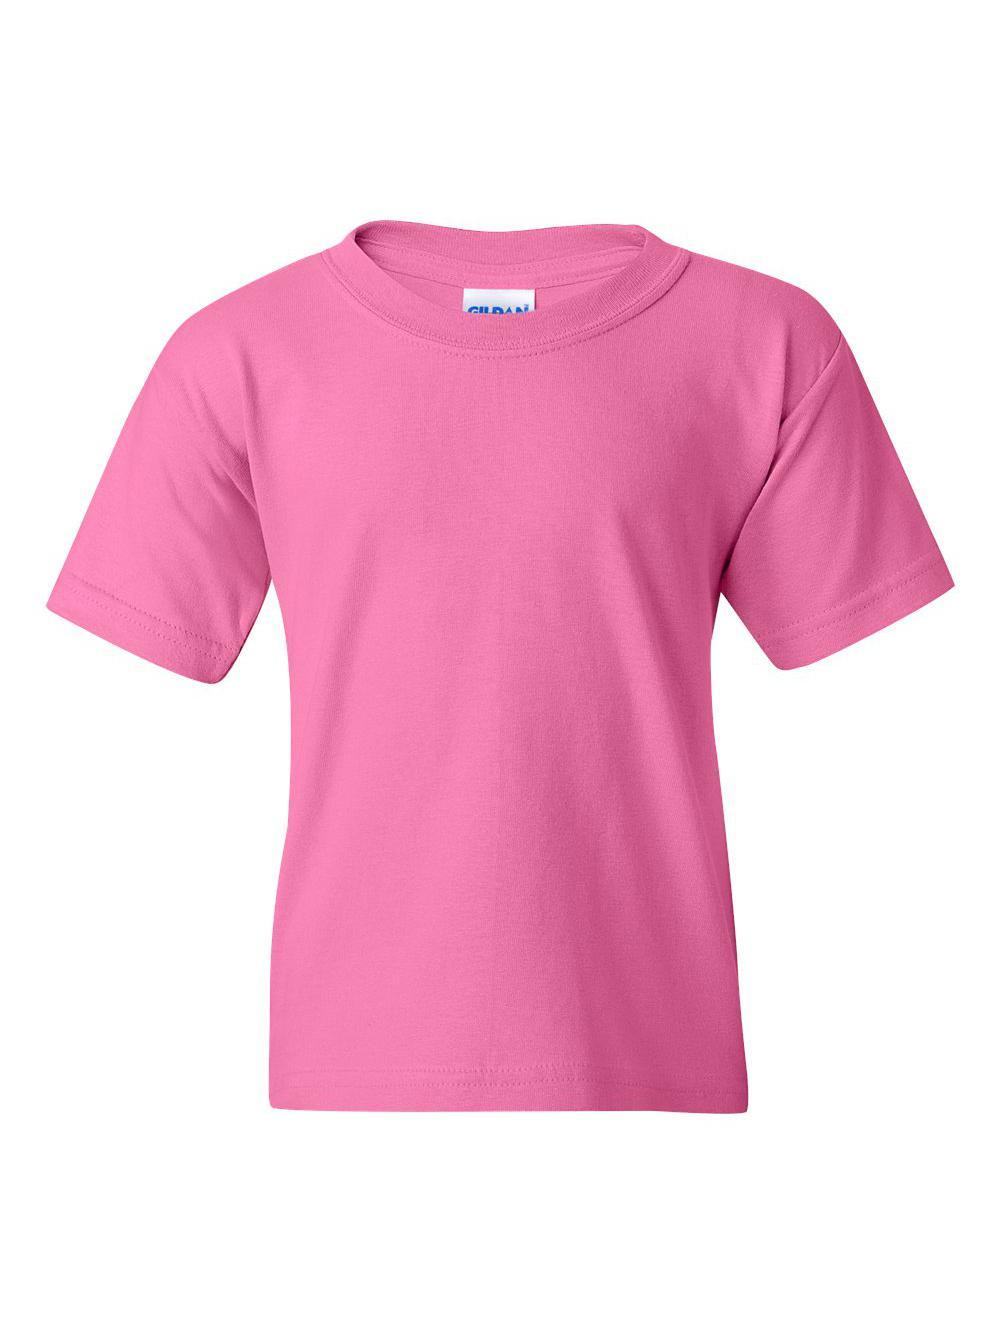 Gildan-Heavy-Cotton-Youth-T-Shirt-5000B thumbnail 6